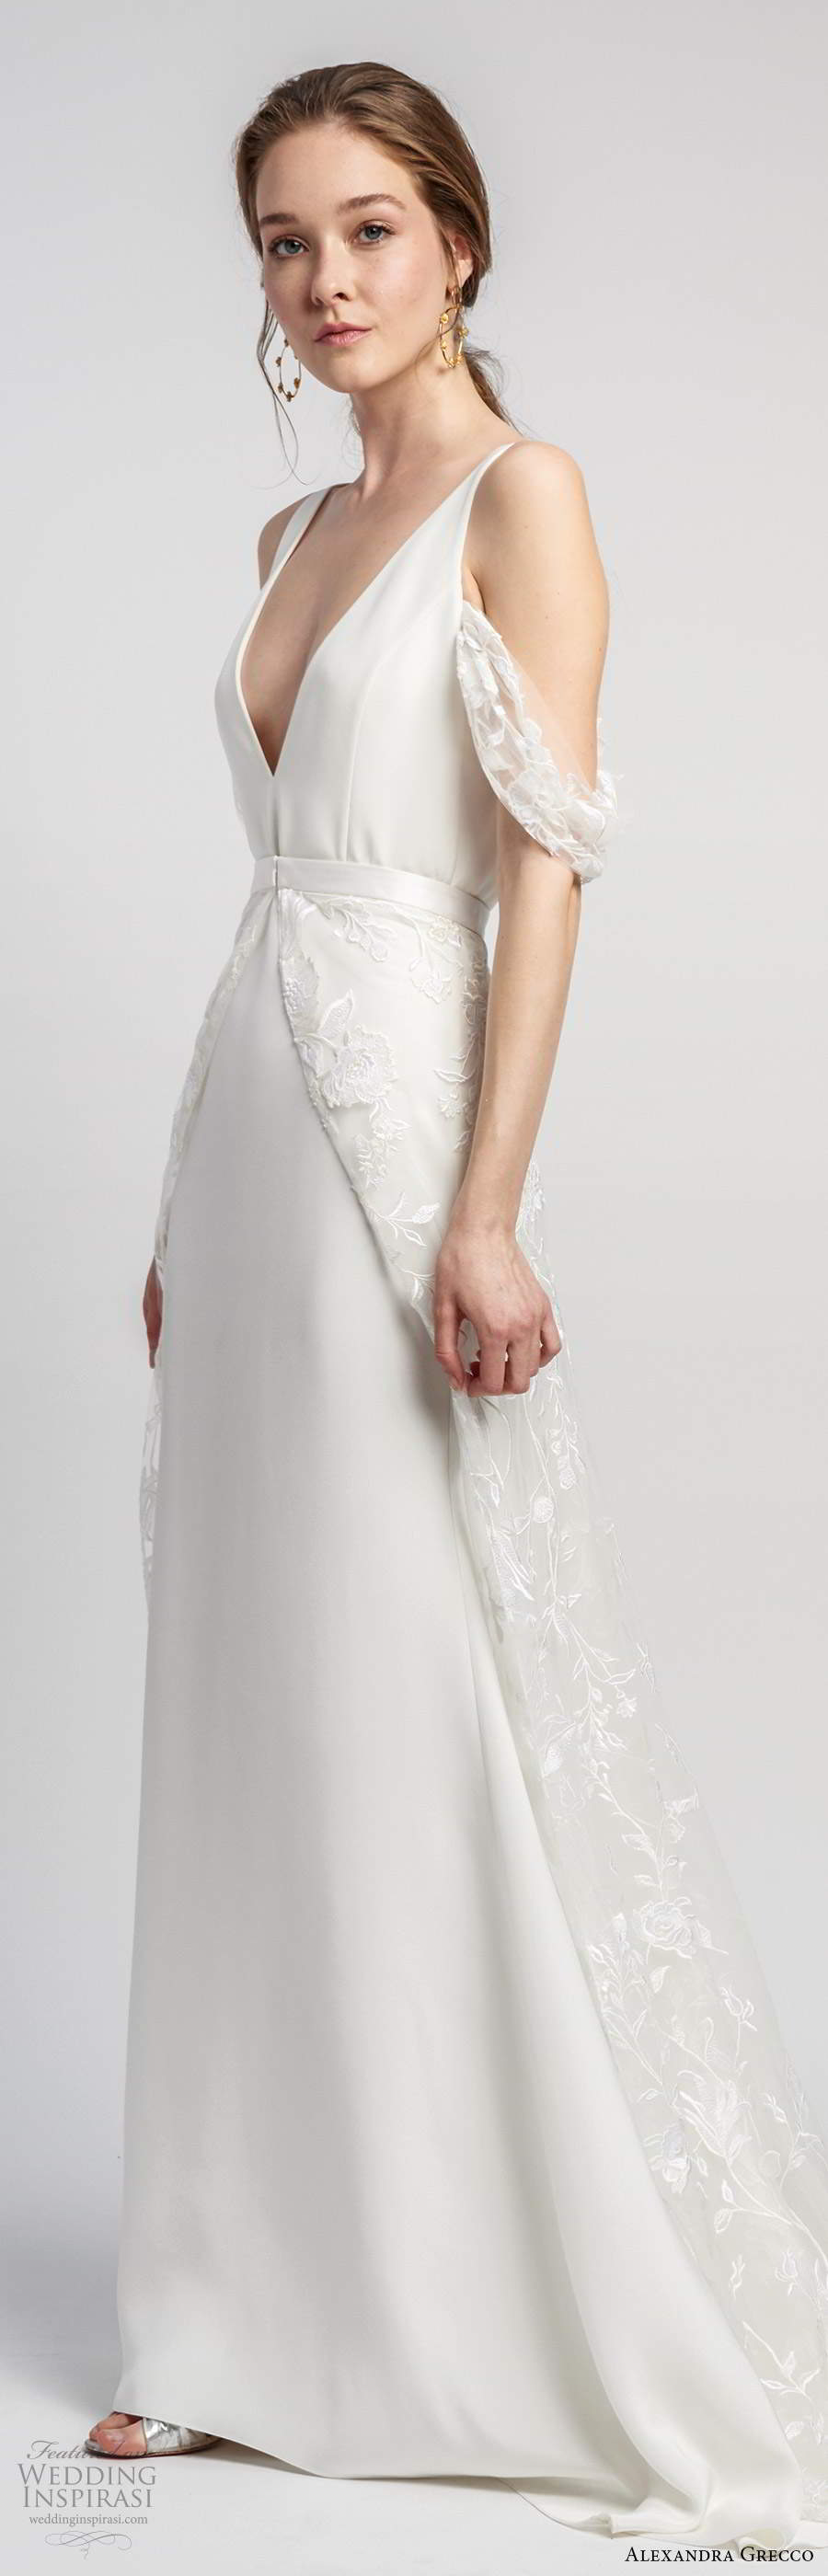 alexandra grecco 2020 bridal sleeveless straps plunging v neckline sheath modern clean minimalist wedding dress a line overskirt v back chapel train (10) mv